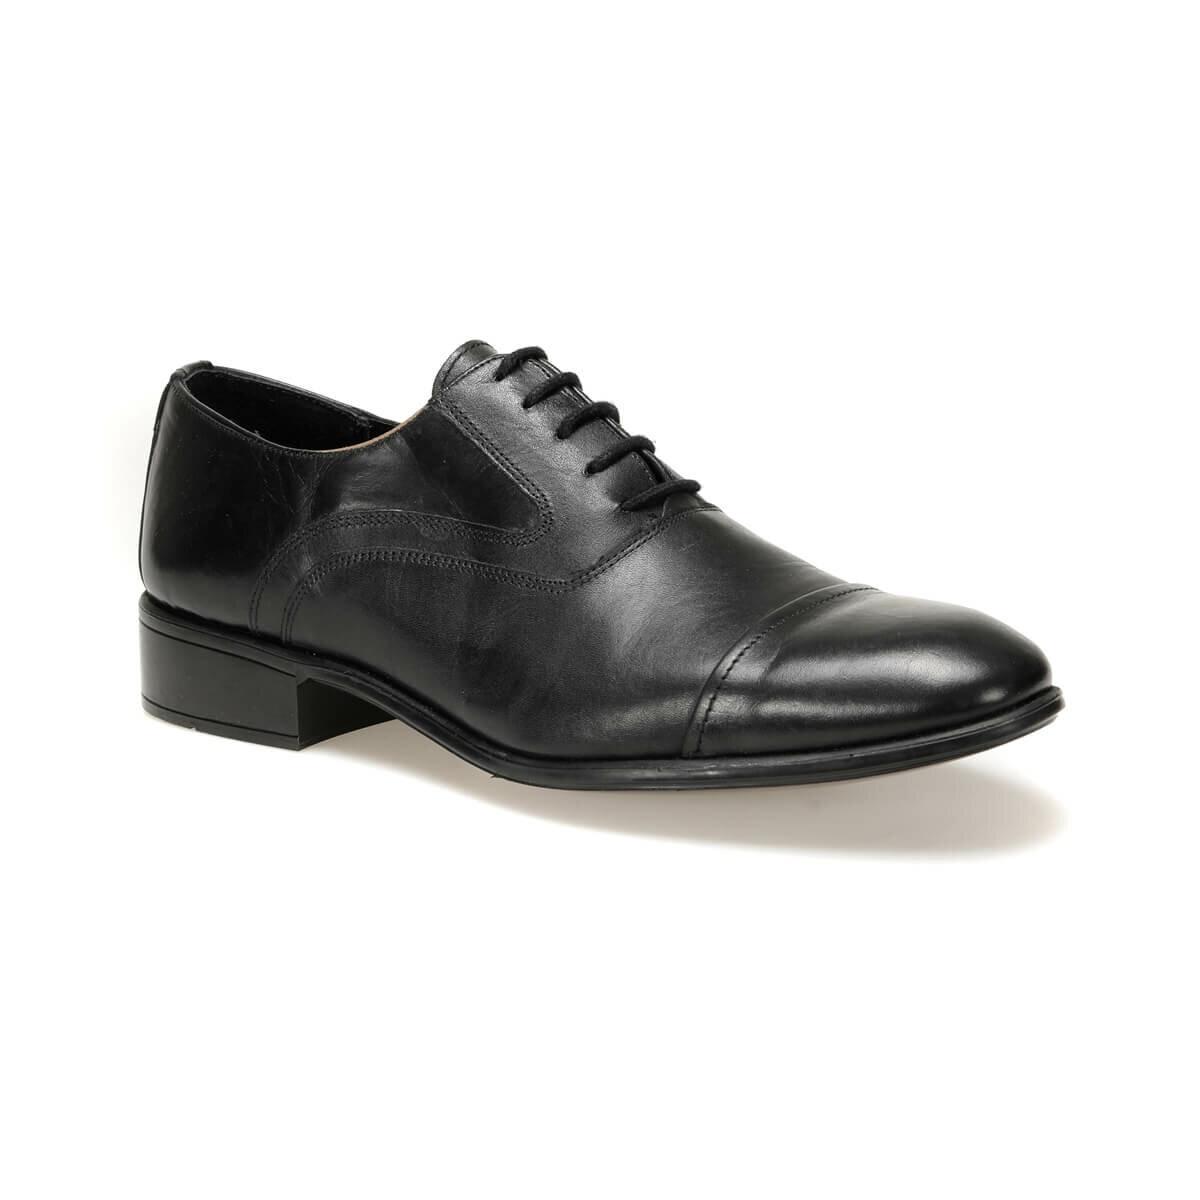 Flo 1018 C 19 黒人男性の古典的な靴 Garamond